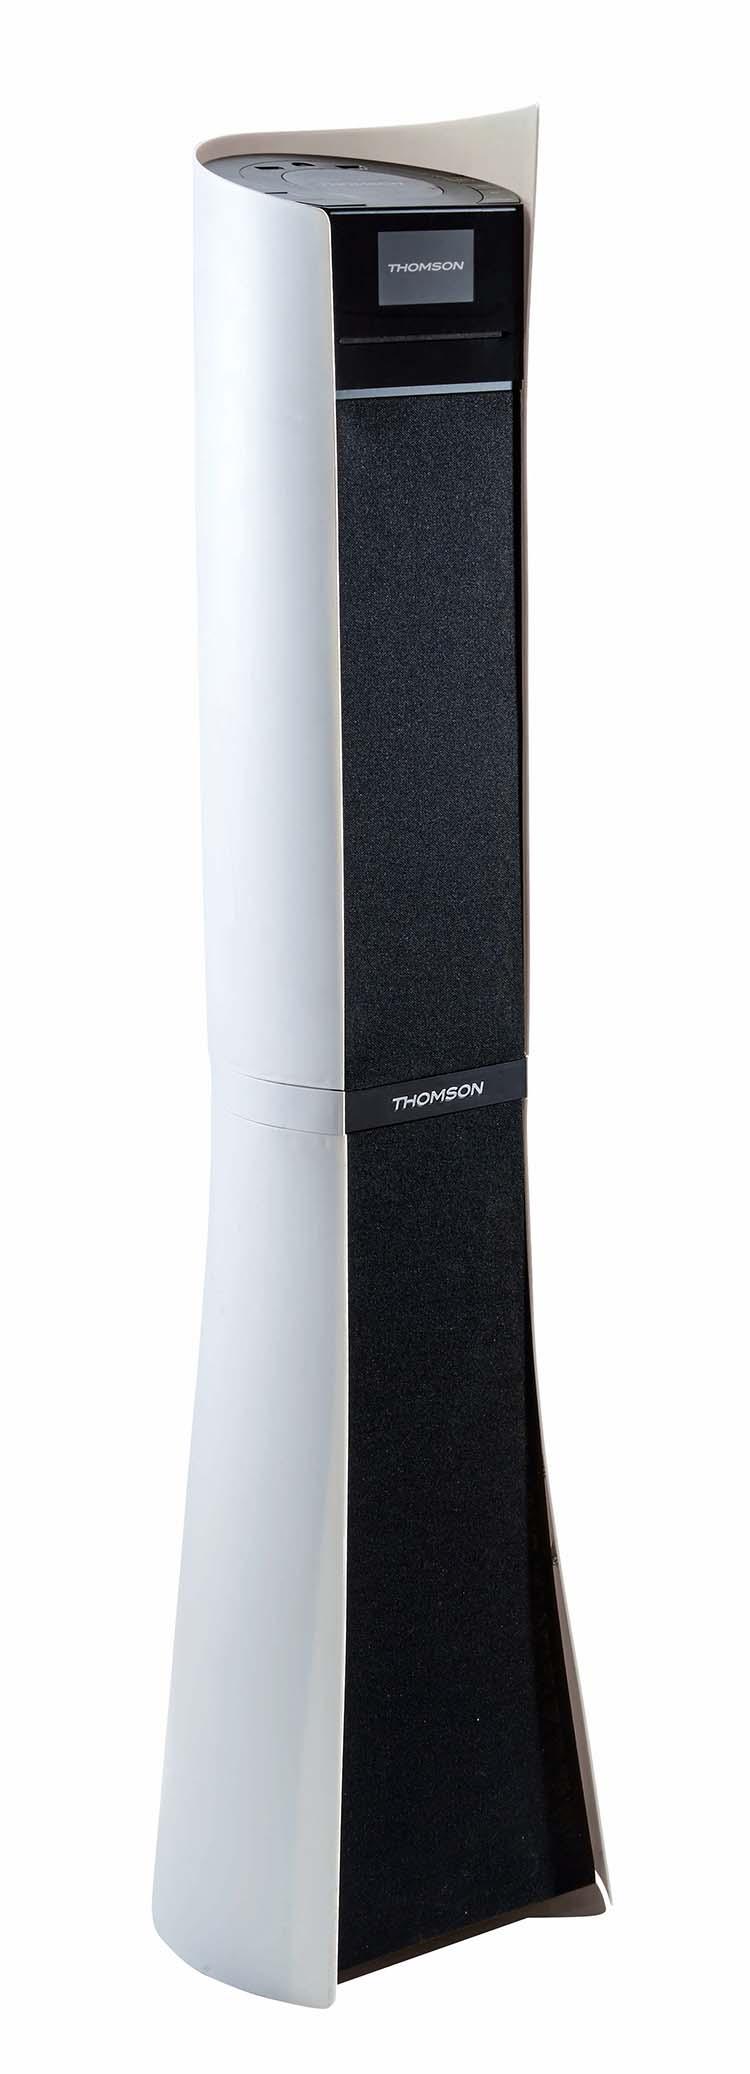 THOMSON Multimedia Tower Ribbon - Packshot